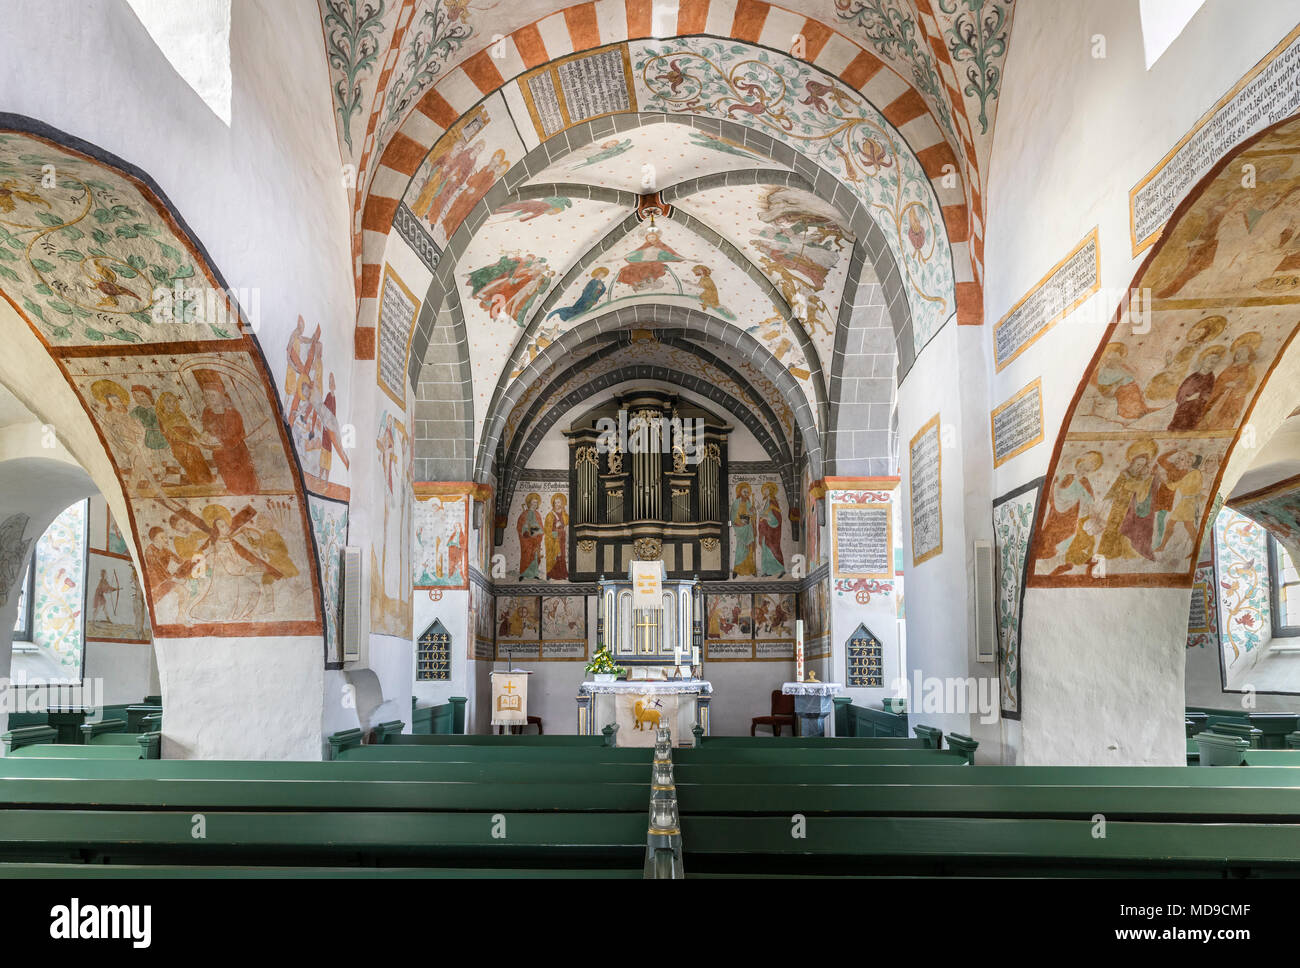 Coro con organo, Bunte Kerke o Bonde Kerke, Lieberhausen, Gummersbach, Bergisches Land, Nord Reno-Westfalia, Germania Immagini Stock